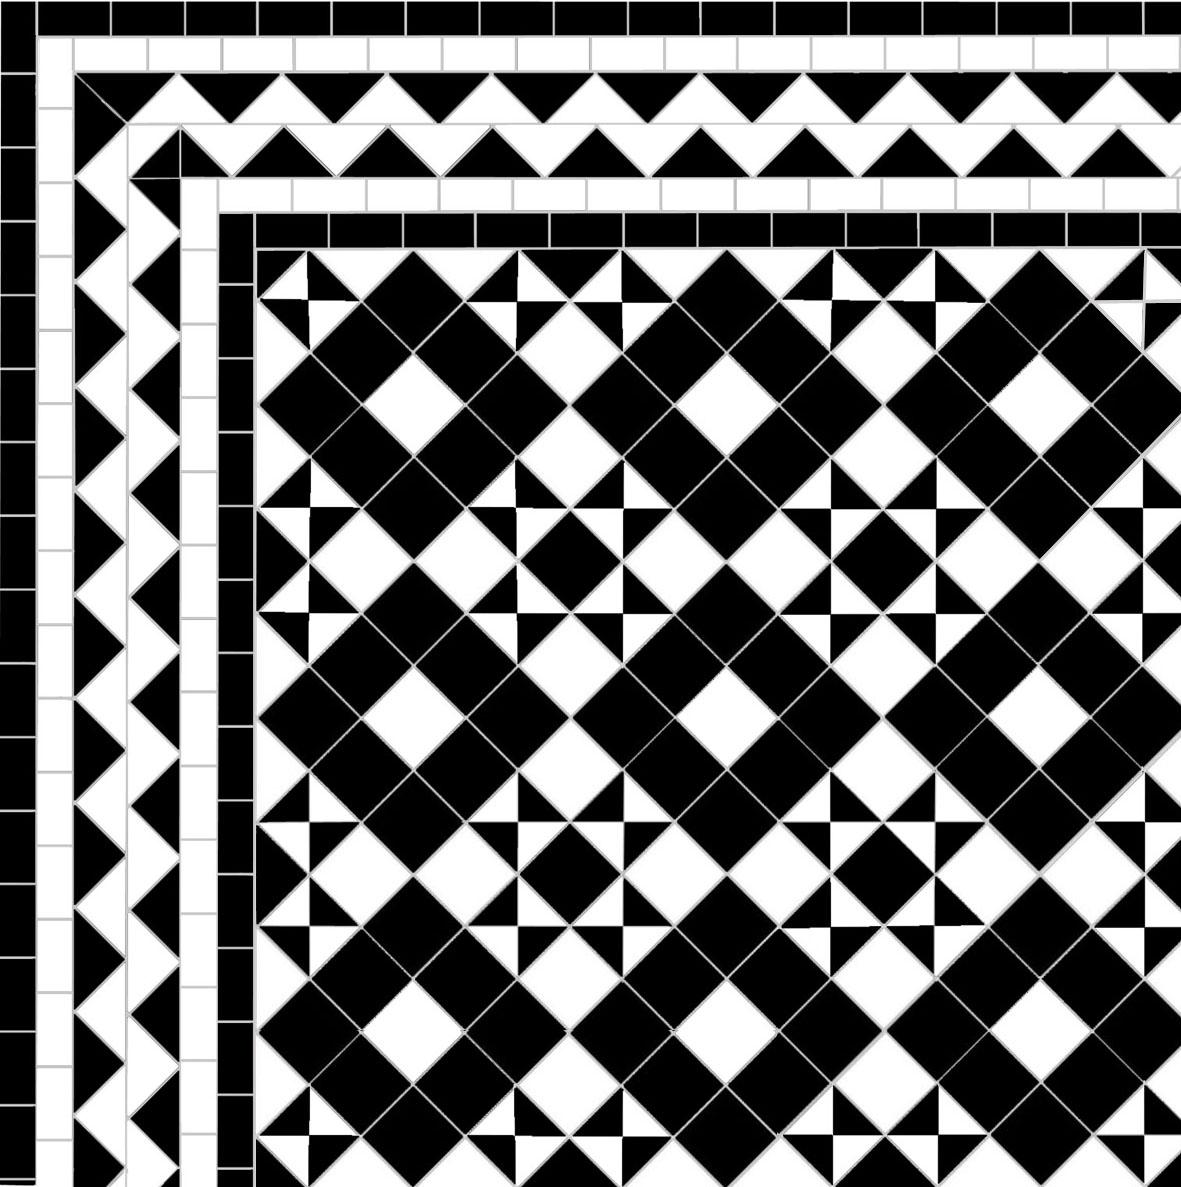 Dark Box & Star - Zig zag Border - white